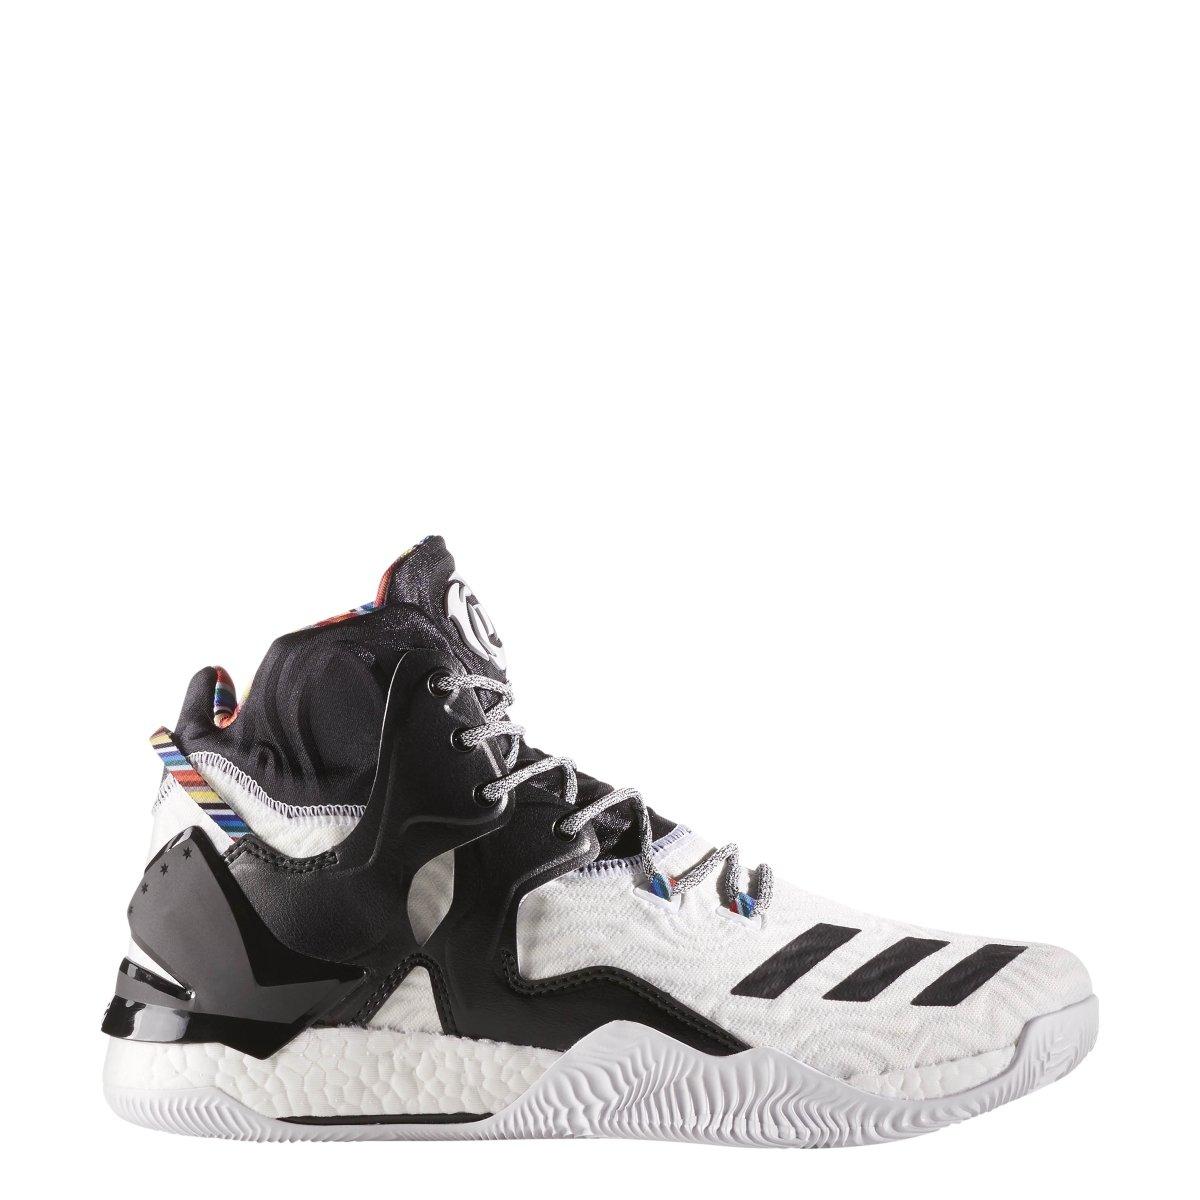 first rate 2aa65 8ae4a Amazon.com   adidas D Rose 7 Shoe - Men s Basketball 16 Running White Black Metallic  Gold   Basketball